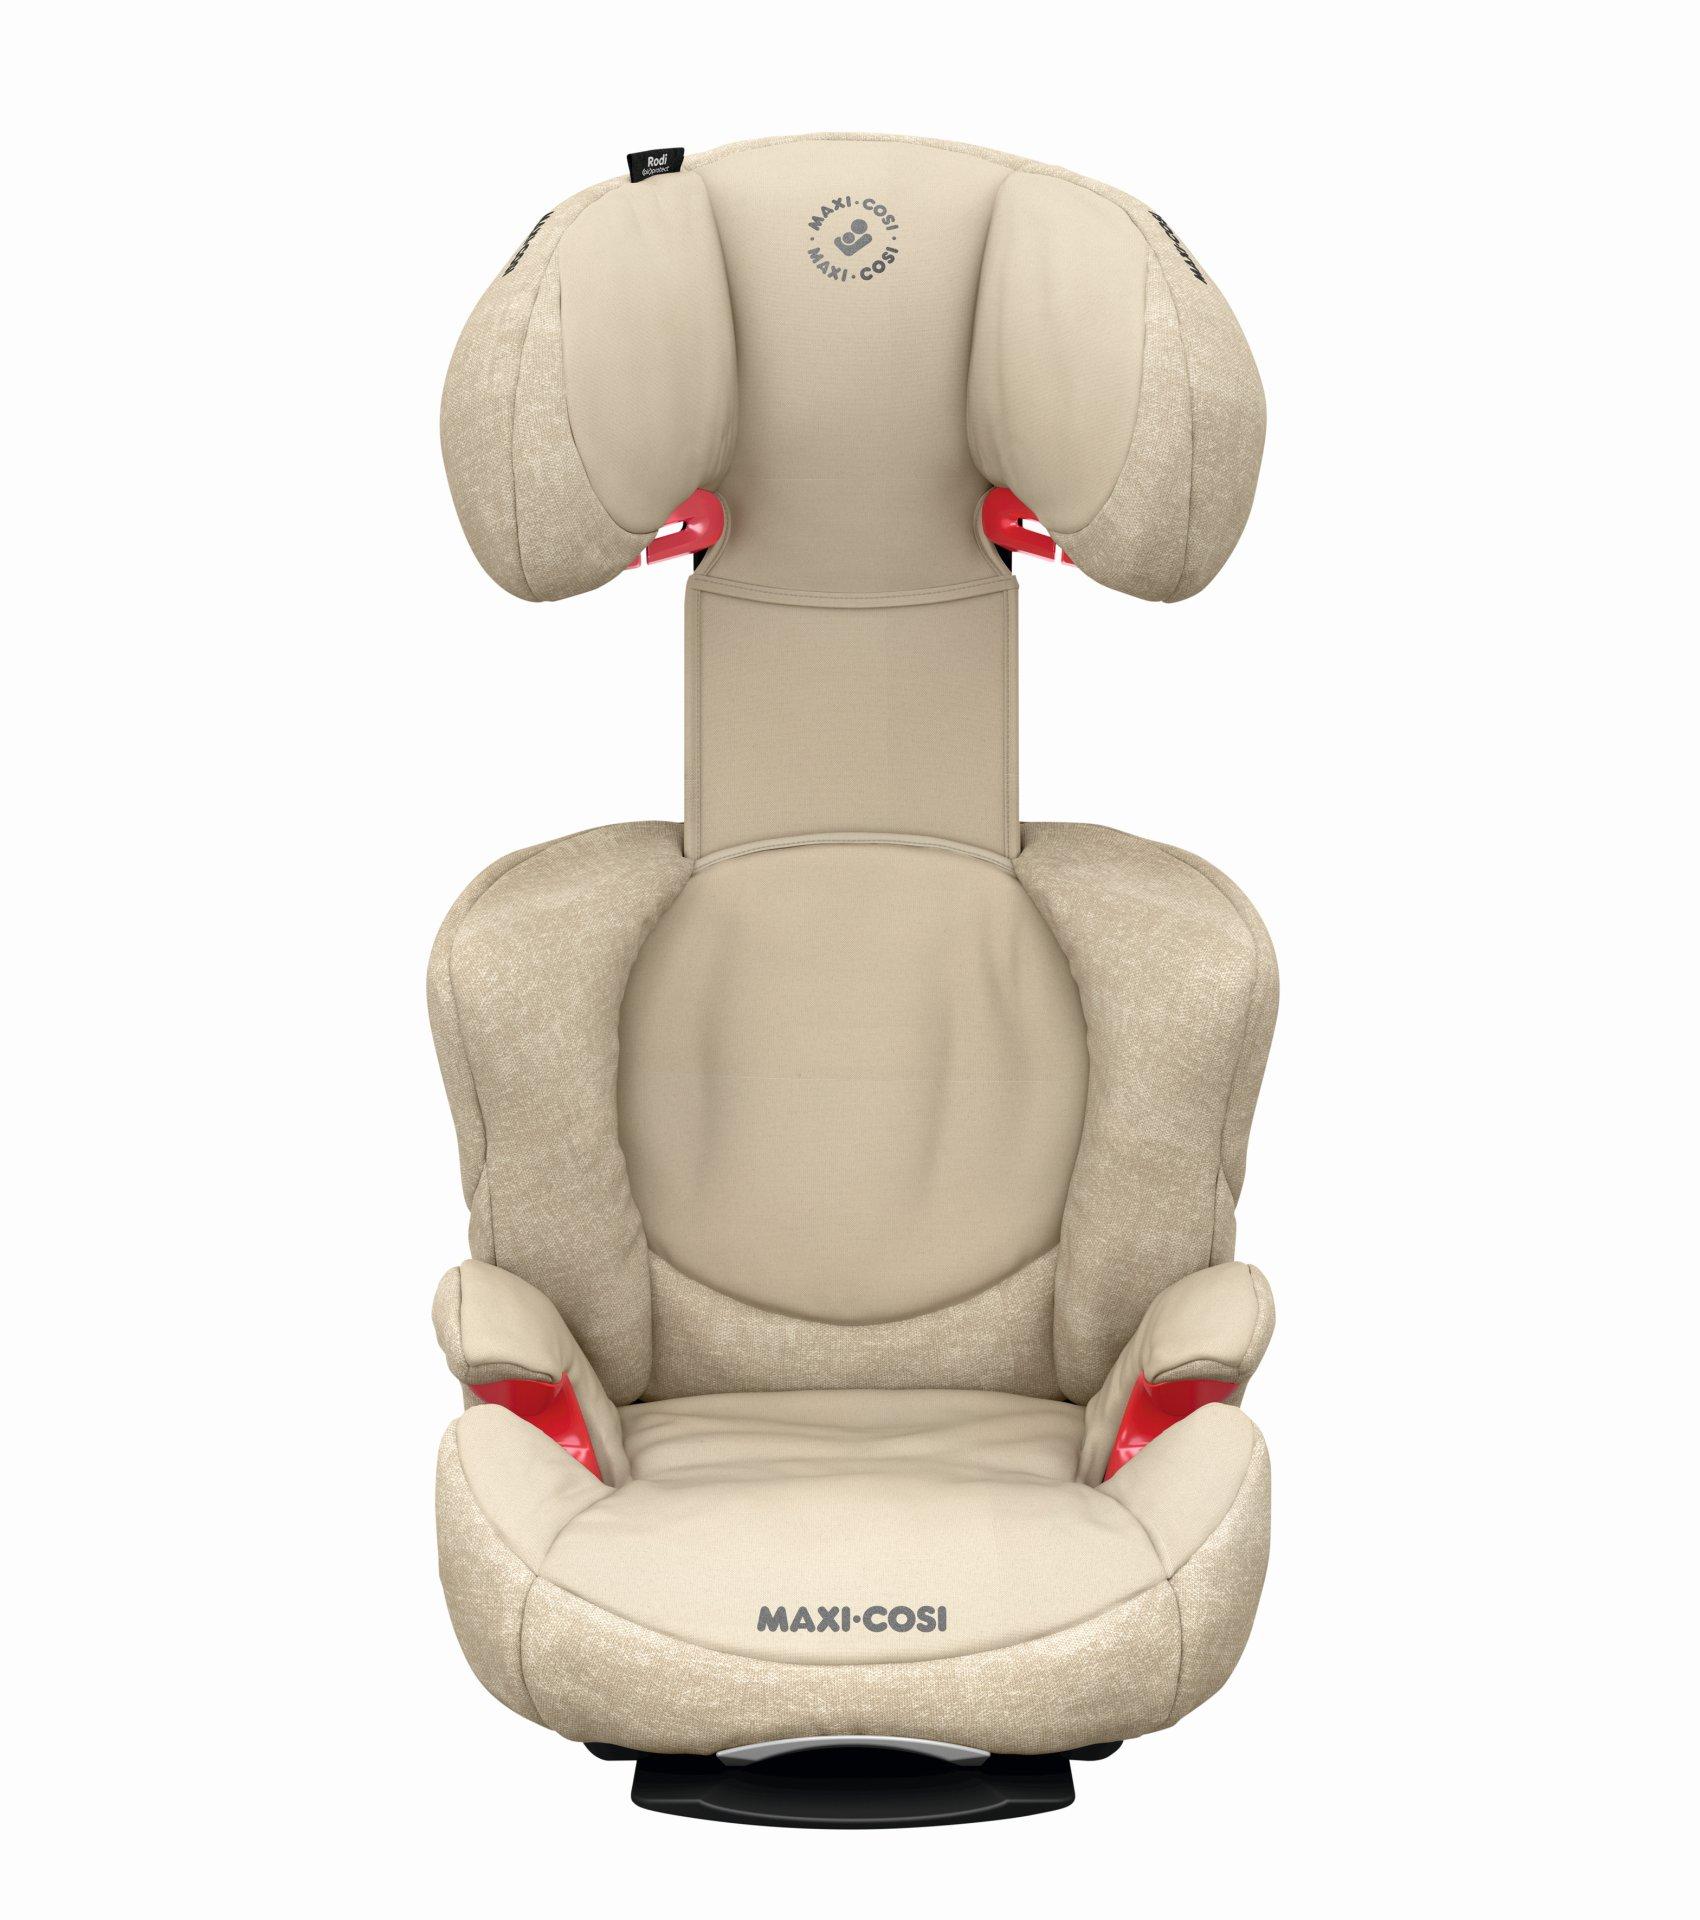 maxi cosi child car seat rodi air protect 2019 nomad sand. Black Bedroom Furniture Sets. Home Design Ideas